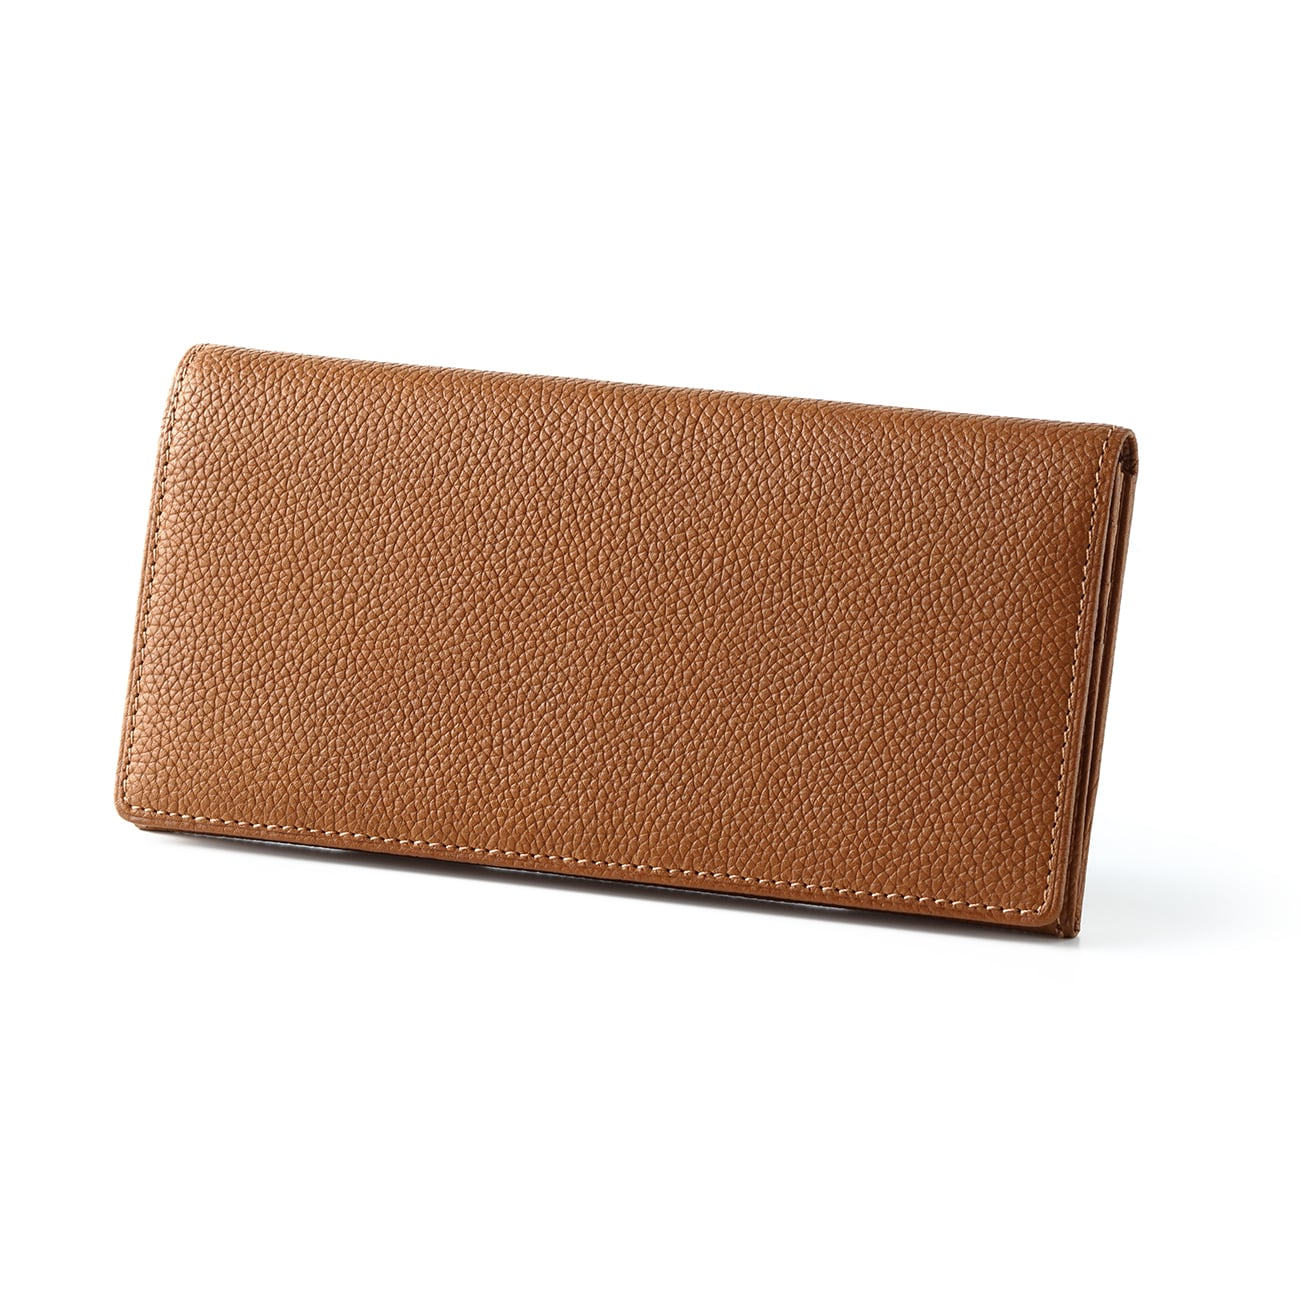 FE-21 長財布